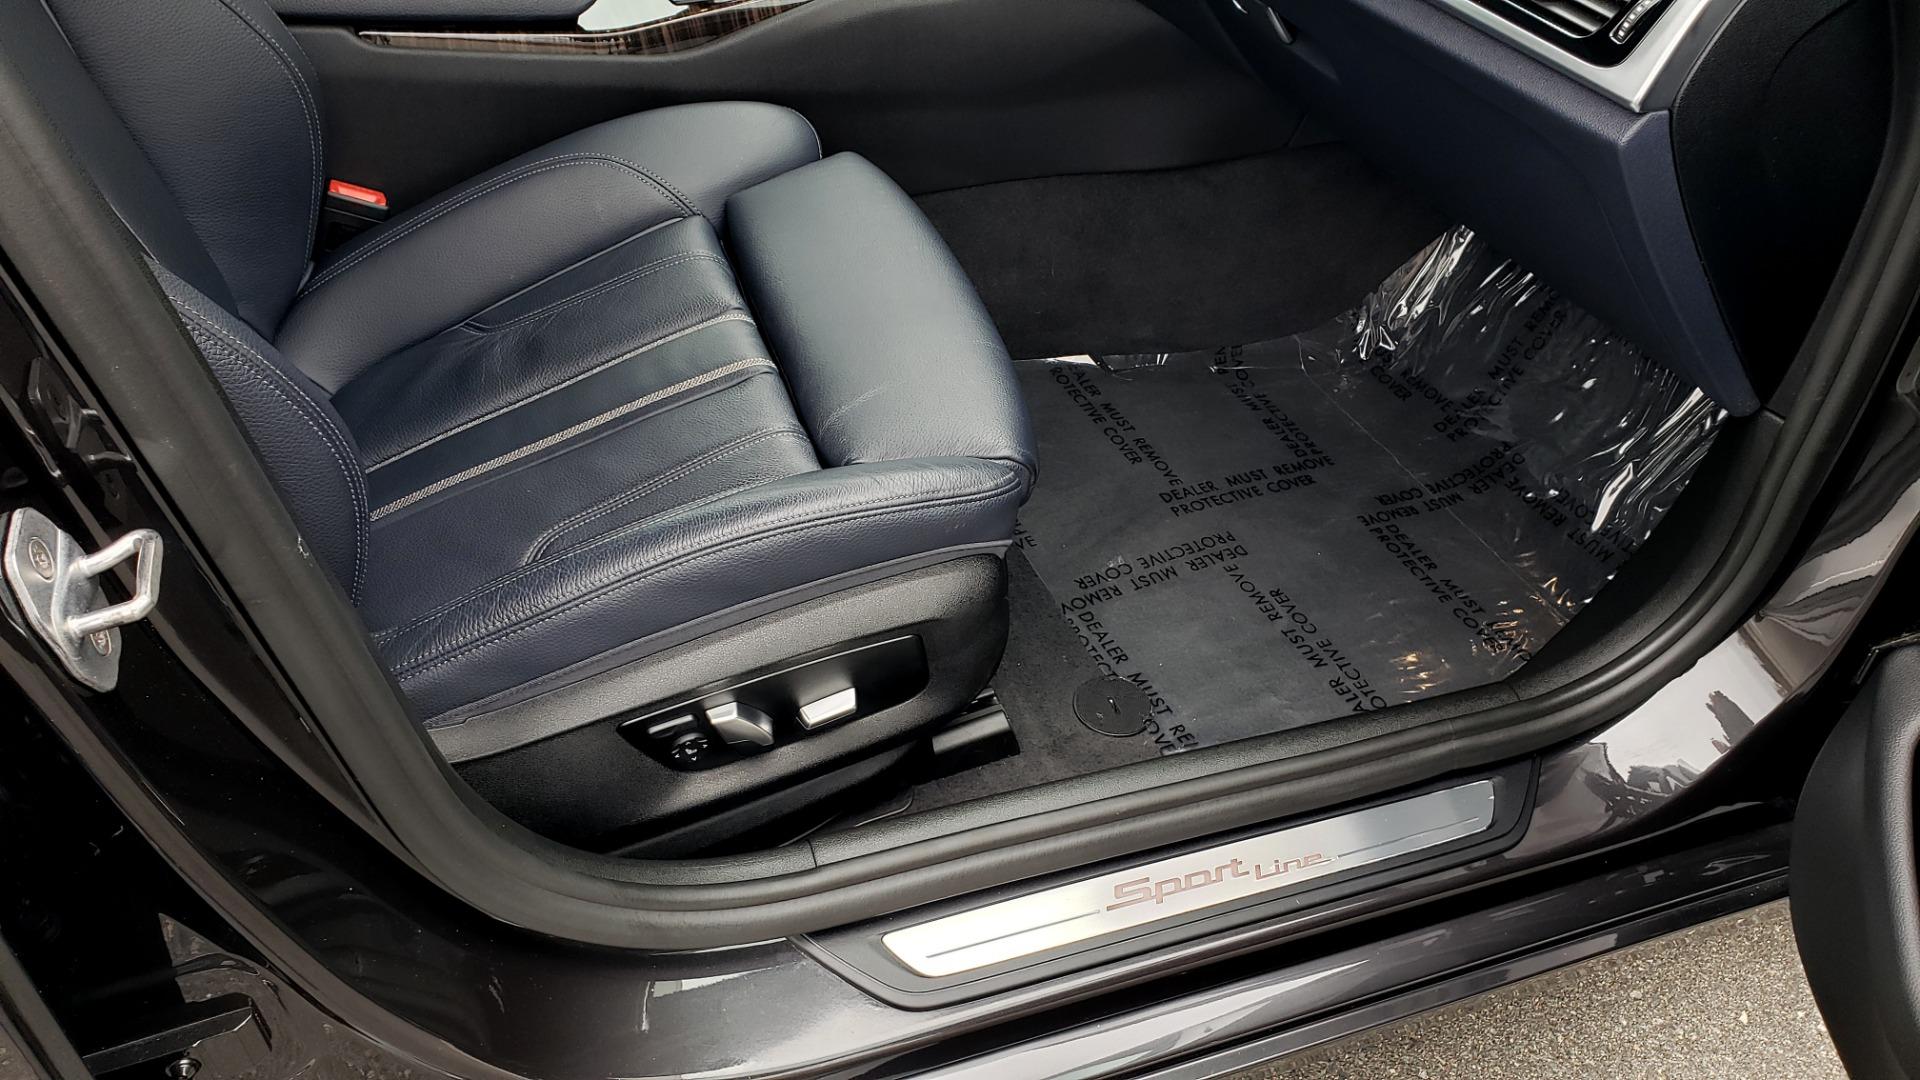 Used 2017 BMW 5 SERIES 530IXDRIVE / PREM PKG / DRVR ASST PLUS / CLD WTHR / APPLE CARPLAY for sale $30,595 at Formula Imports in Charlotte NC 28227 66